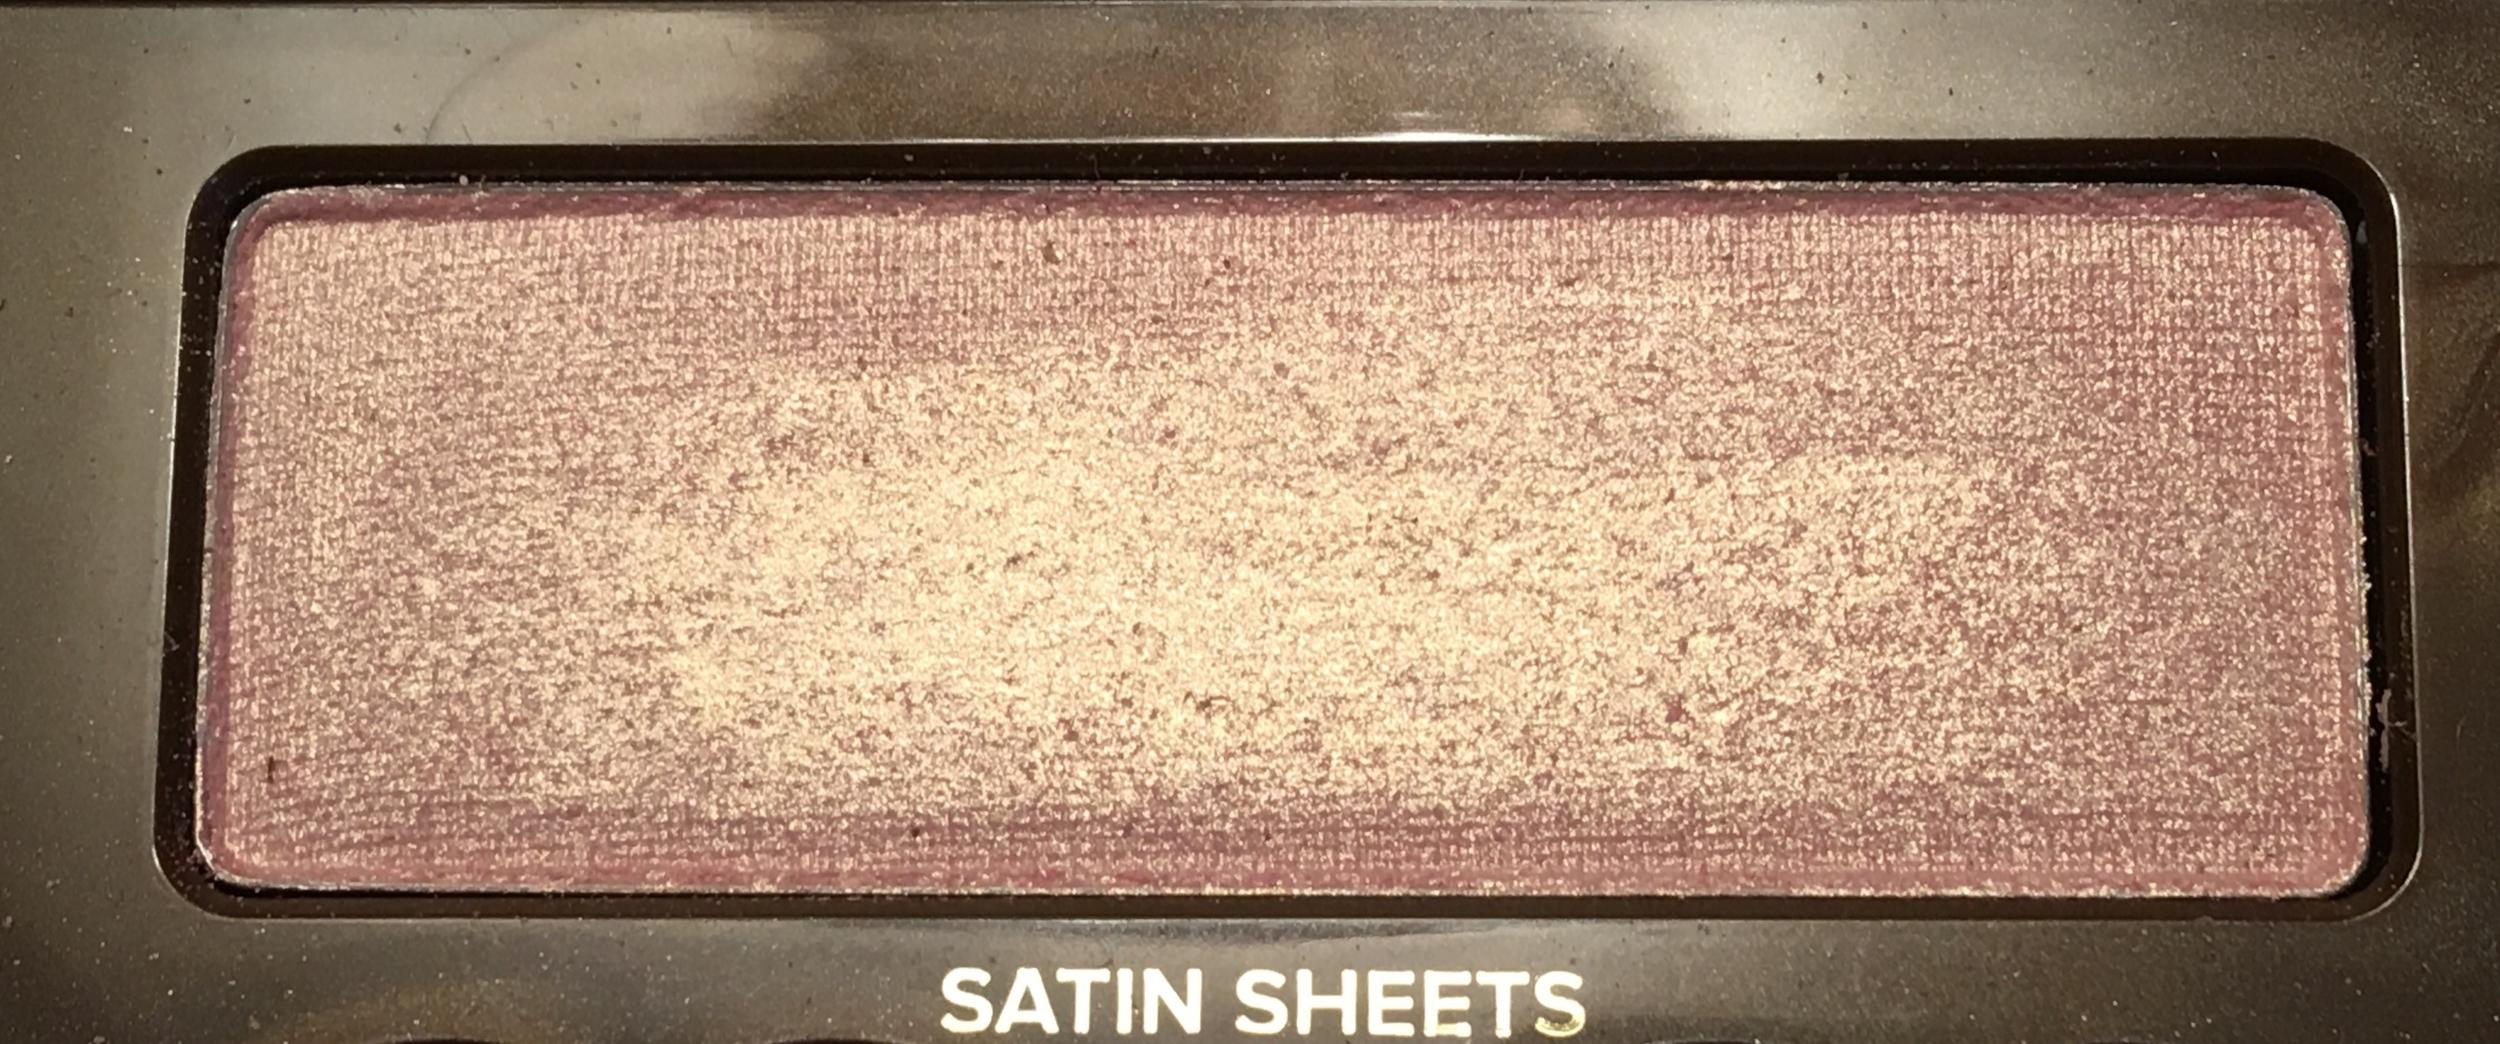 Satin Sheets (Golden Pink)